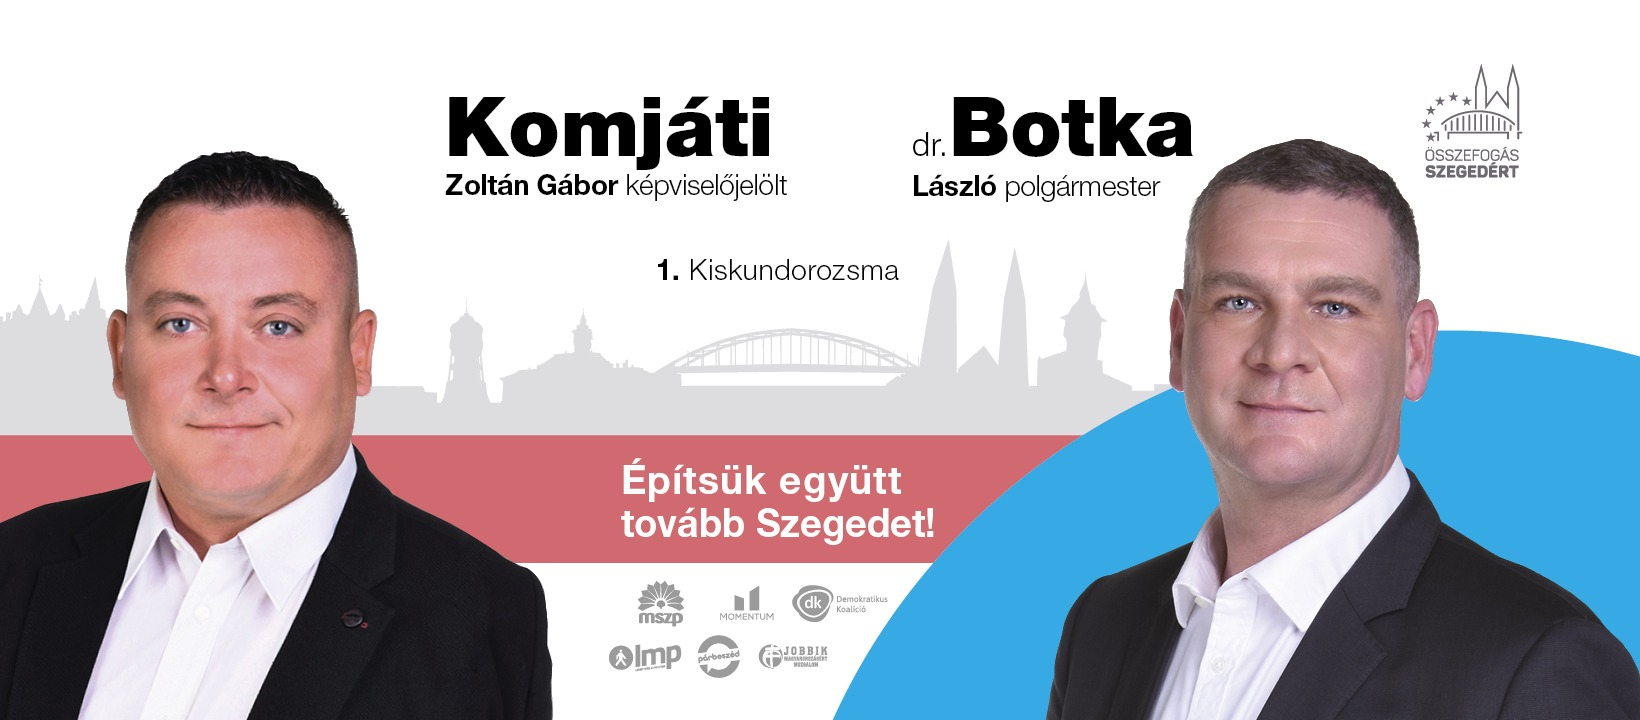 Komjáti Zoltán Gábor